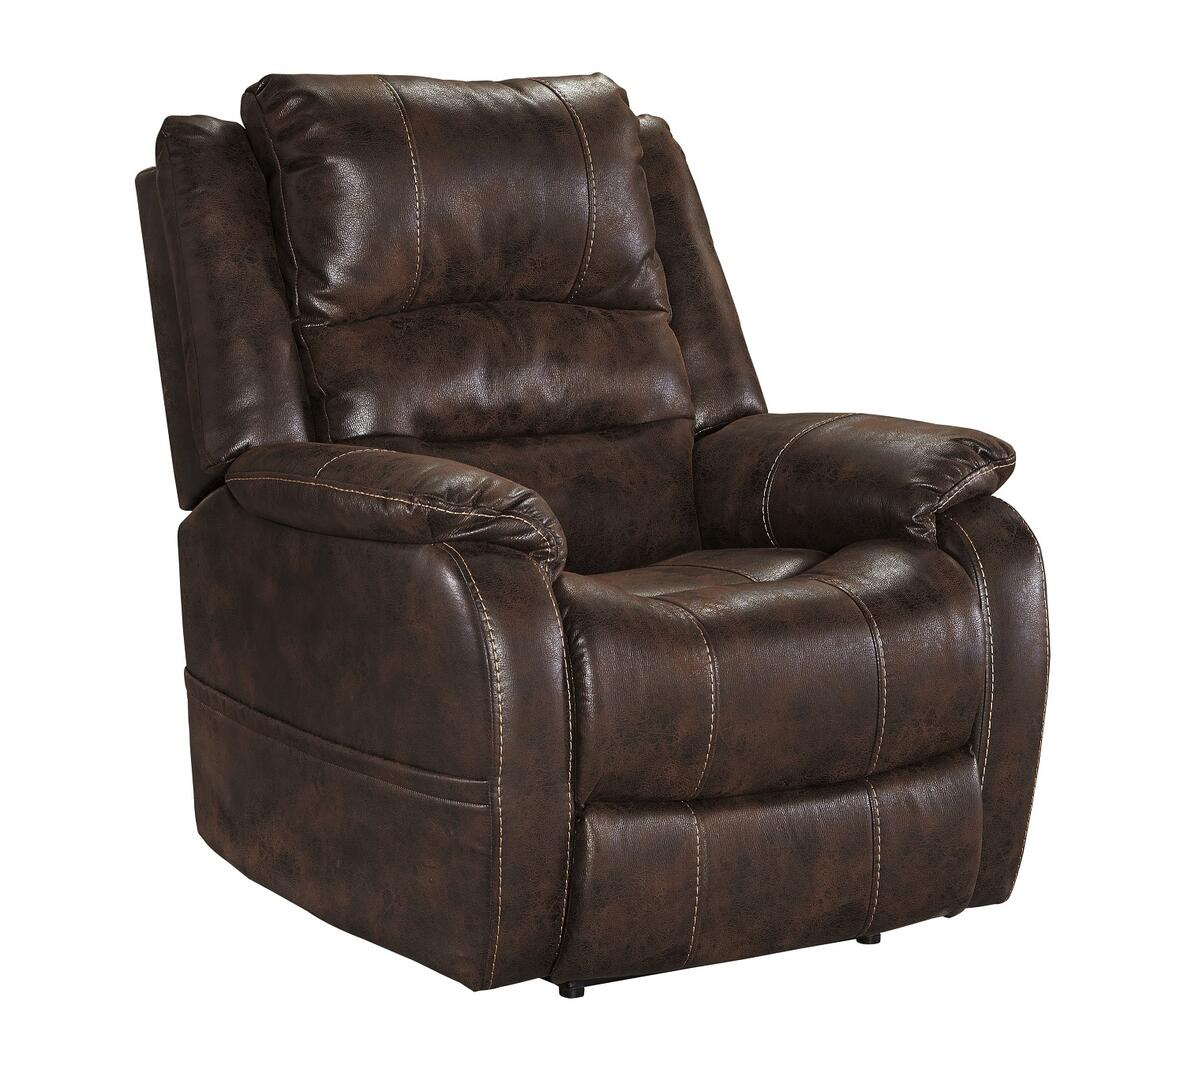 Ashley Furniture No Interest: Signature Design By Ashley 6880213 Barling Series